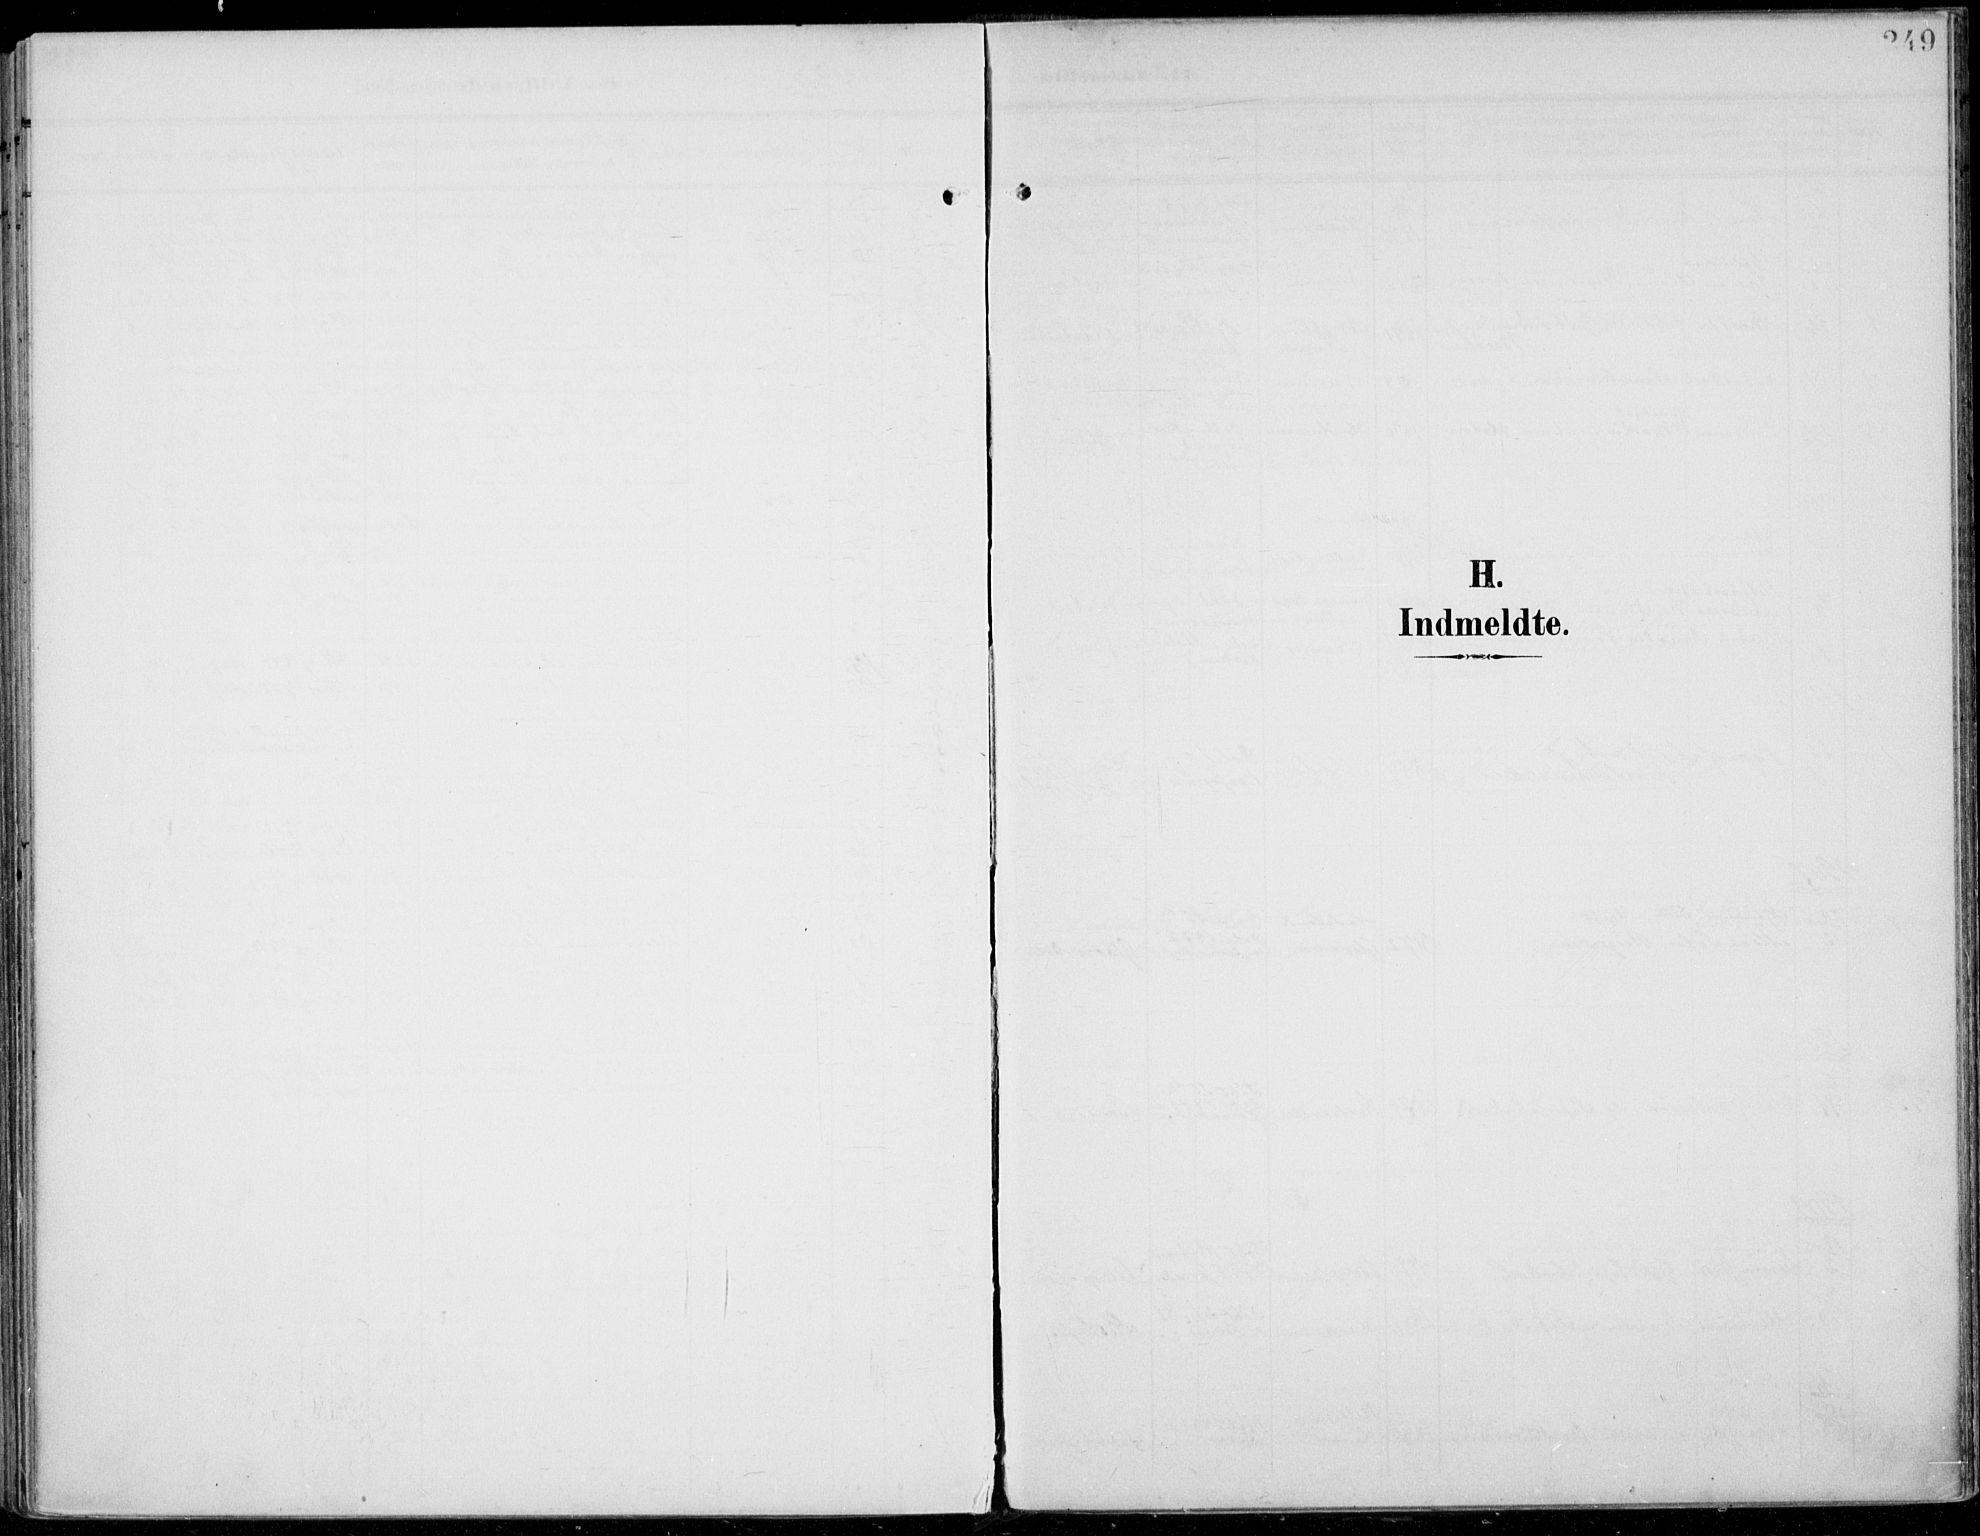 SAH, Jevnaker prestekontor, Ministerialbok nr. 11, 1902-1913, s. 249